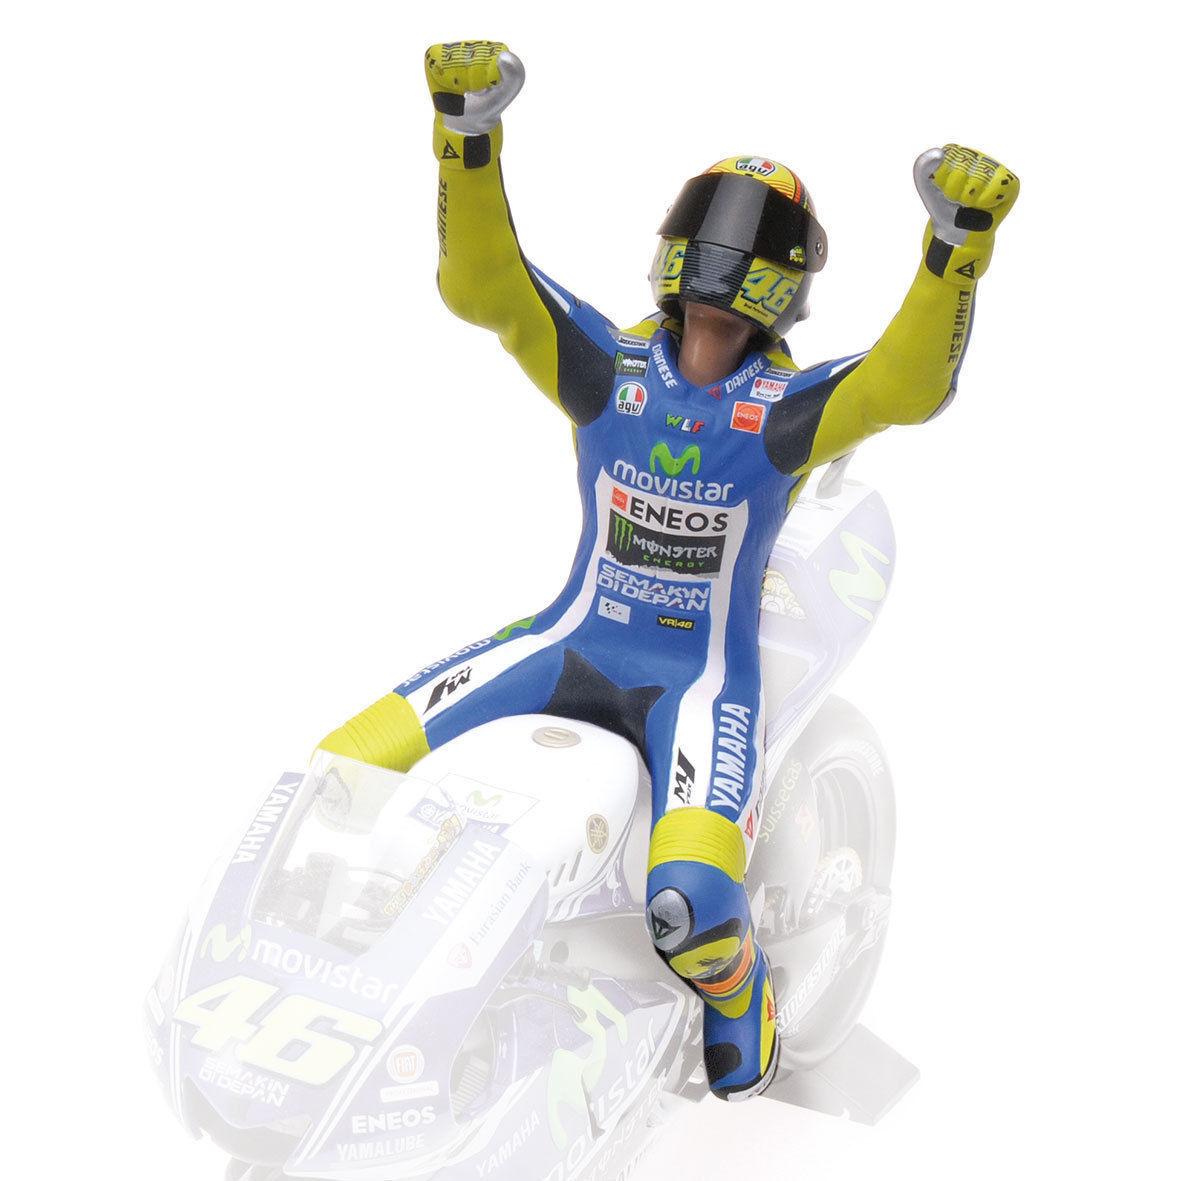 MINICHAMPS VALENTINO ROSSI 1 12 12 12 FIGURA YAMAHA MOTOGP WINNER GP AUSTRALIA 2014 584c0f